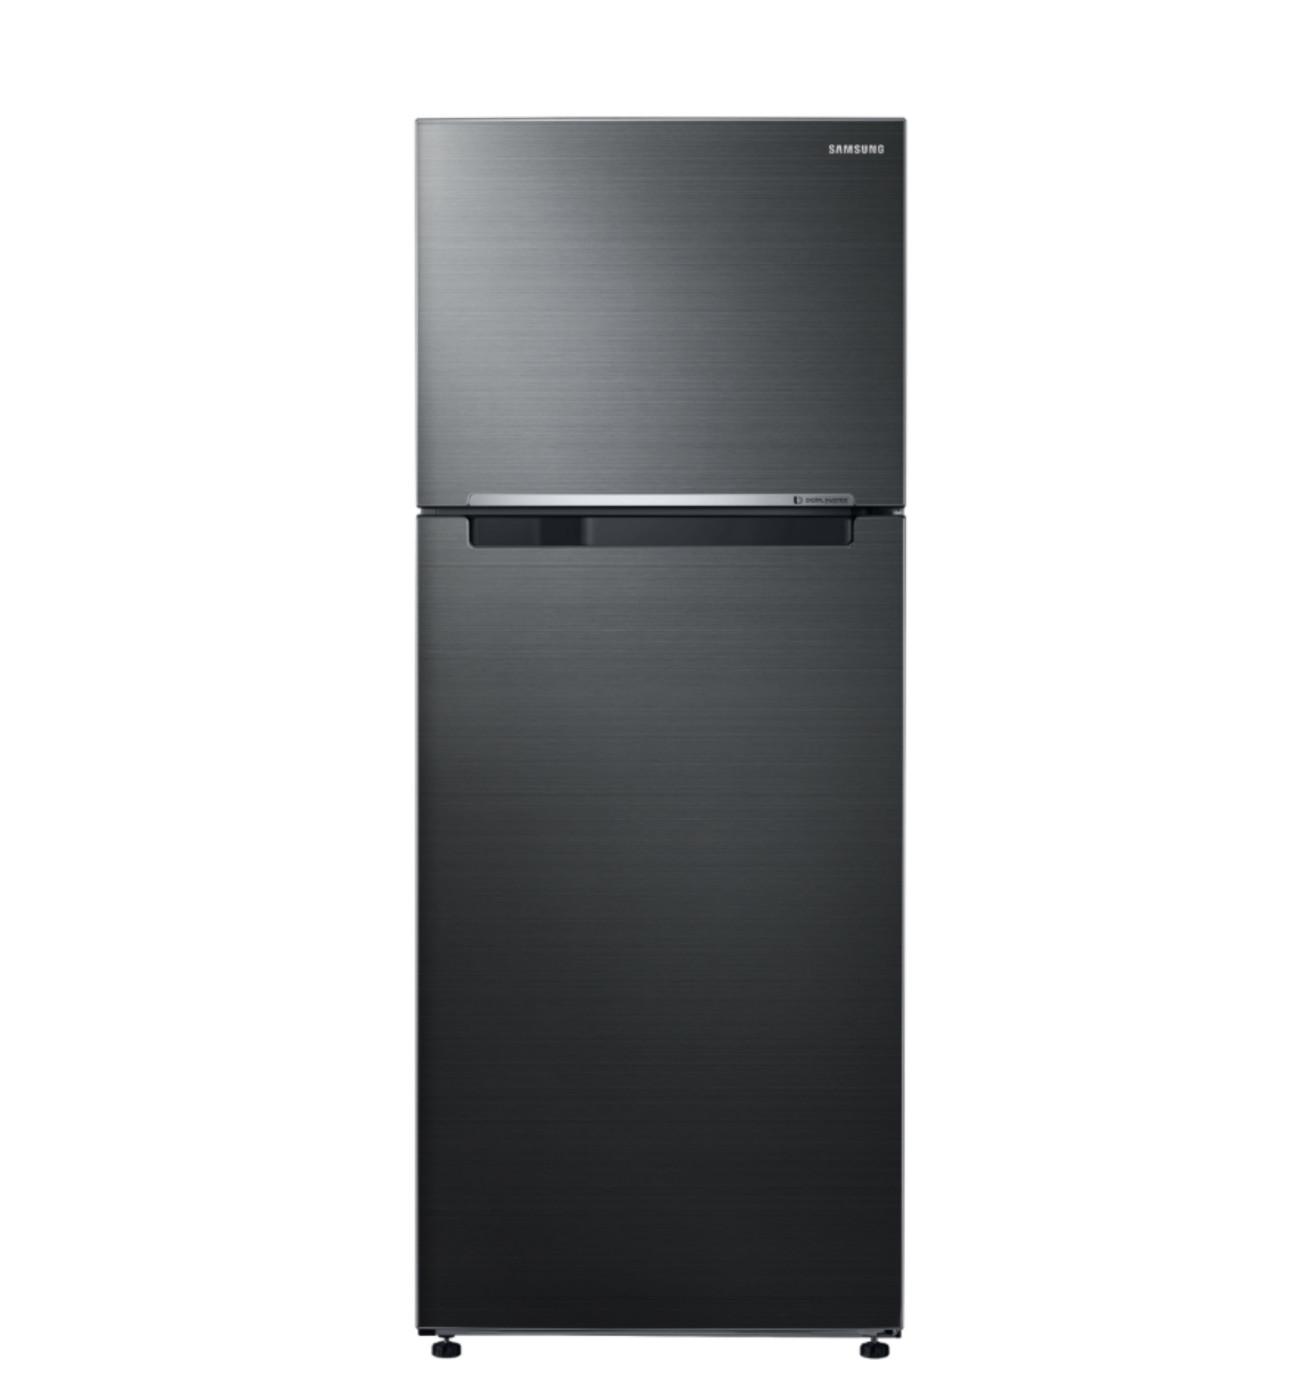 sr467btc 471l top mount fridge metallic black